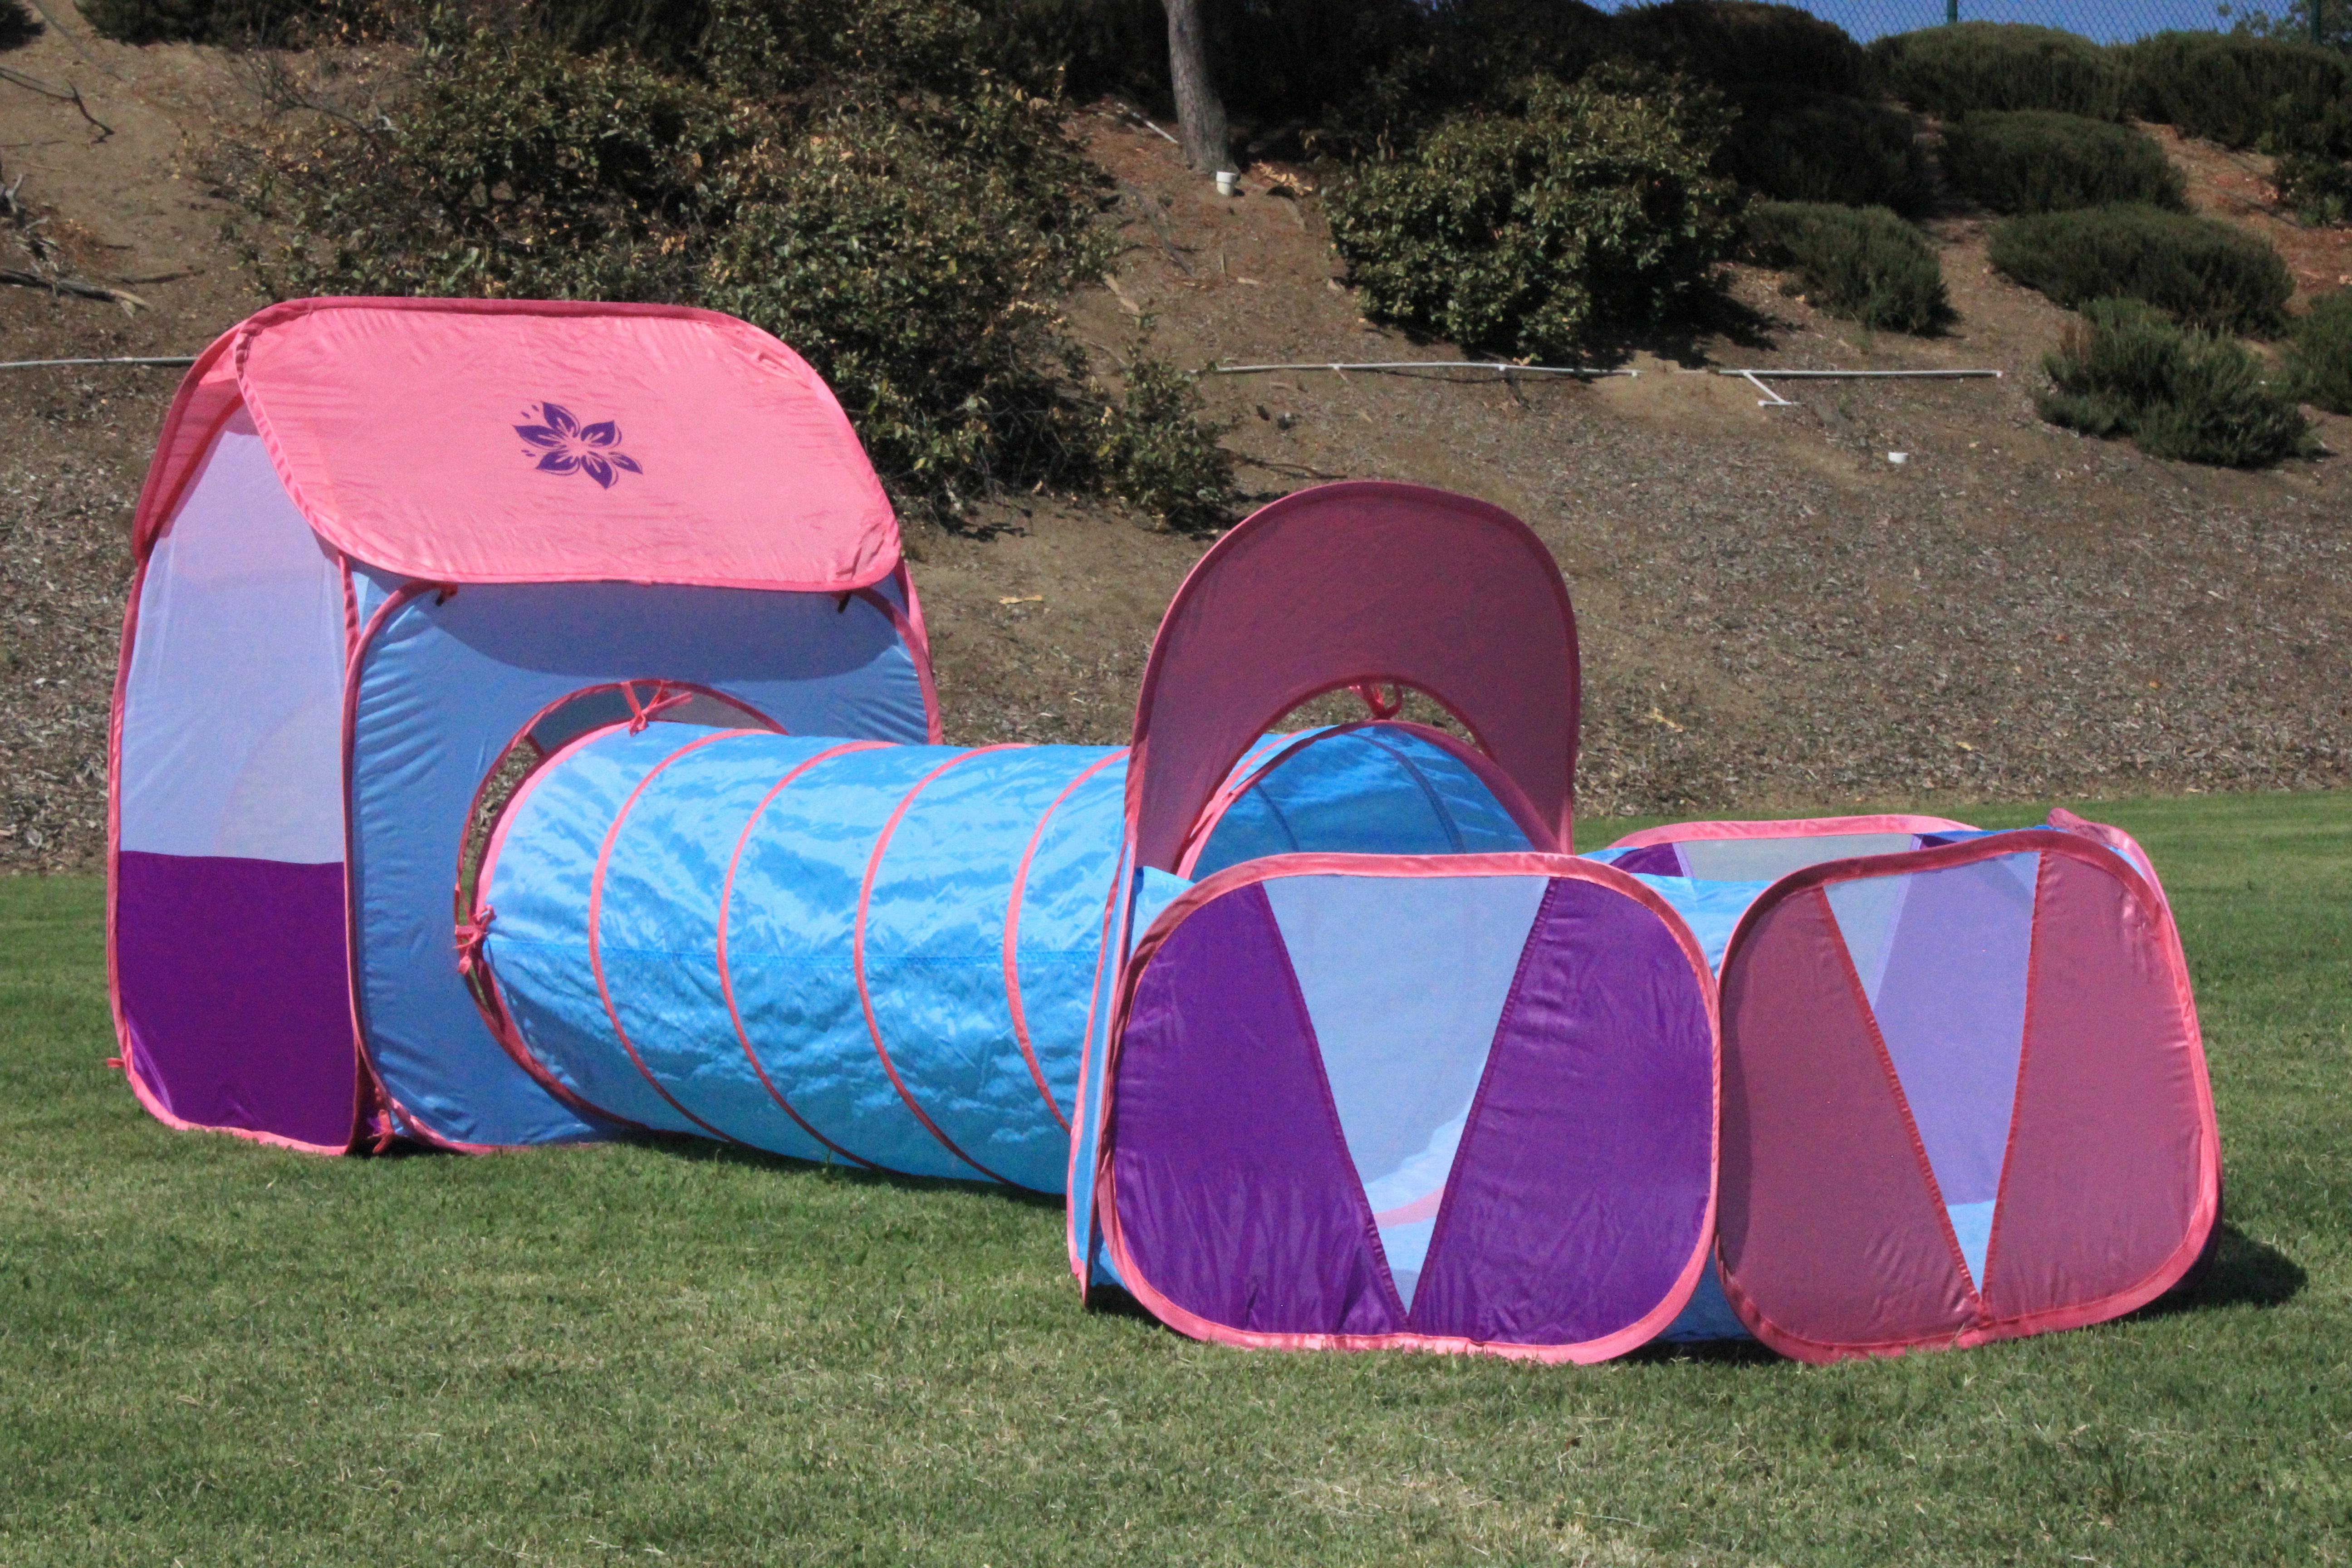 96-KE12-6FBV Ball Pit Pop-Up Play Tent - (Pink & Ball Pit Pop-Up Play Tent - (Pink Purple Blue) | G3Elite ...